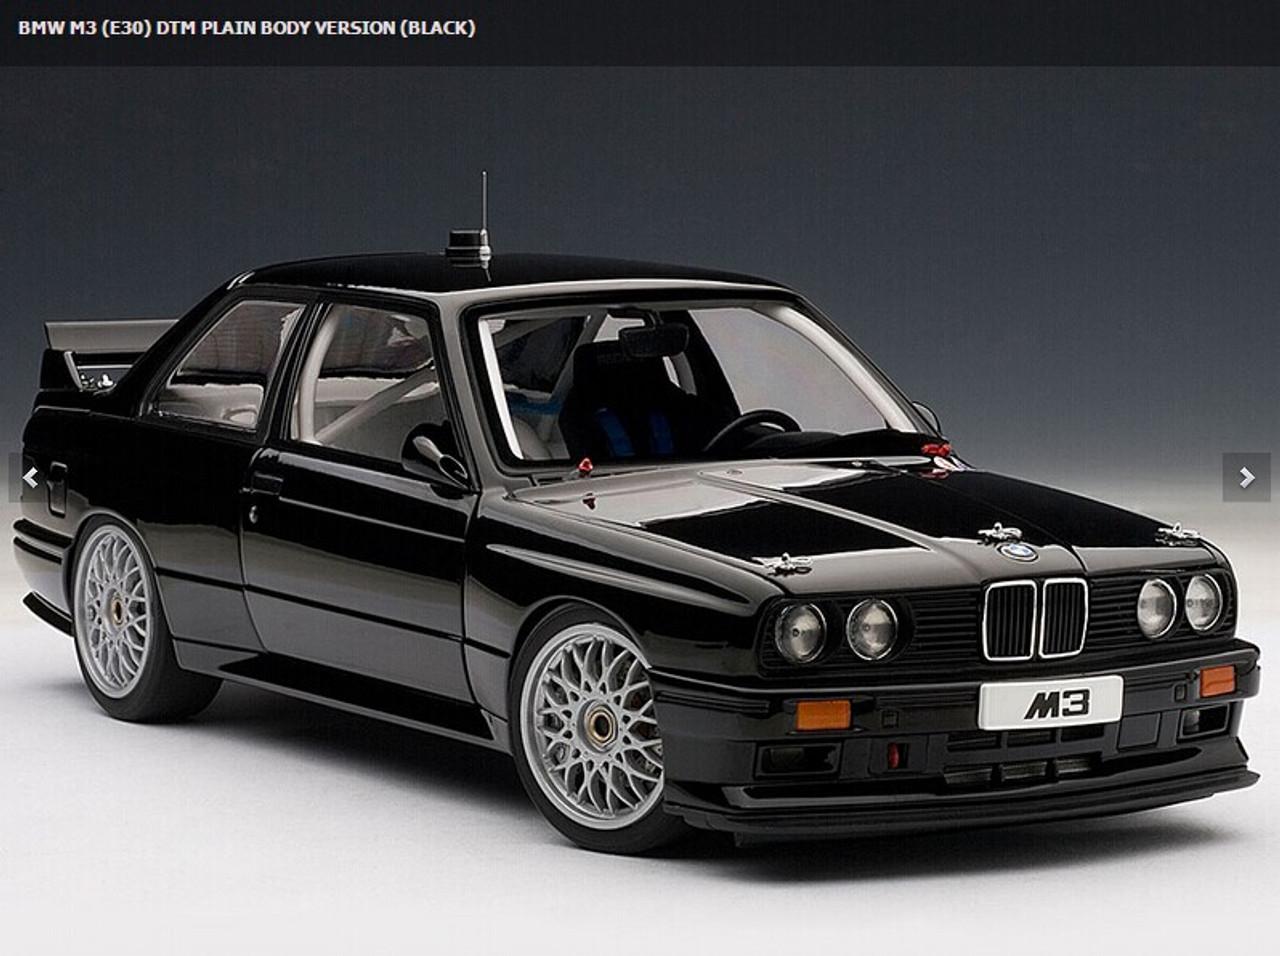 Bmw M3 E30 >> 1 18 Autoart Bmw M3 E30 Dtm Plain Body Version Black